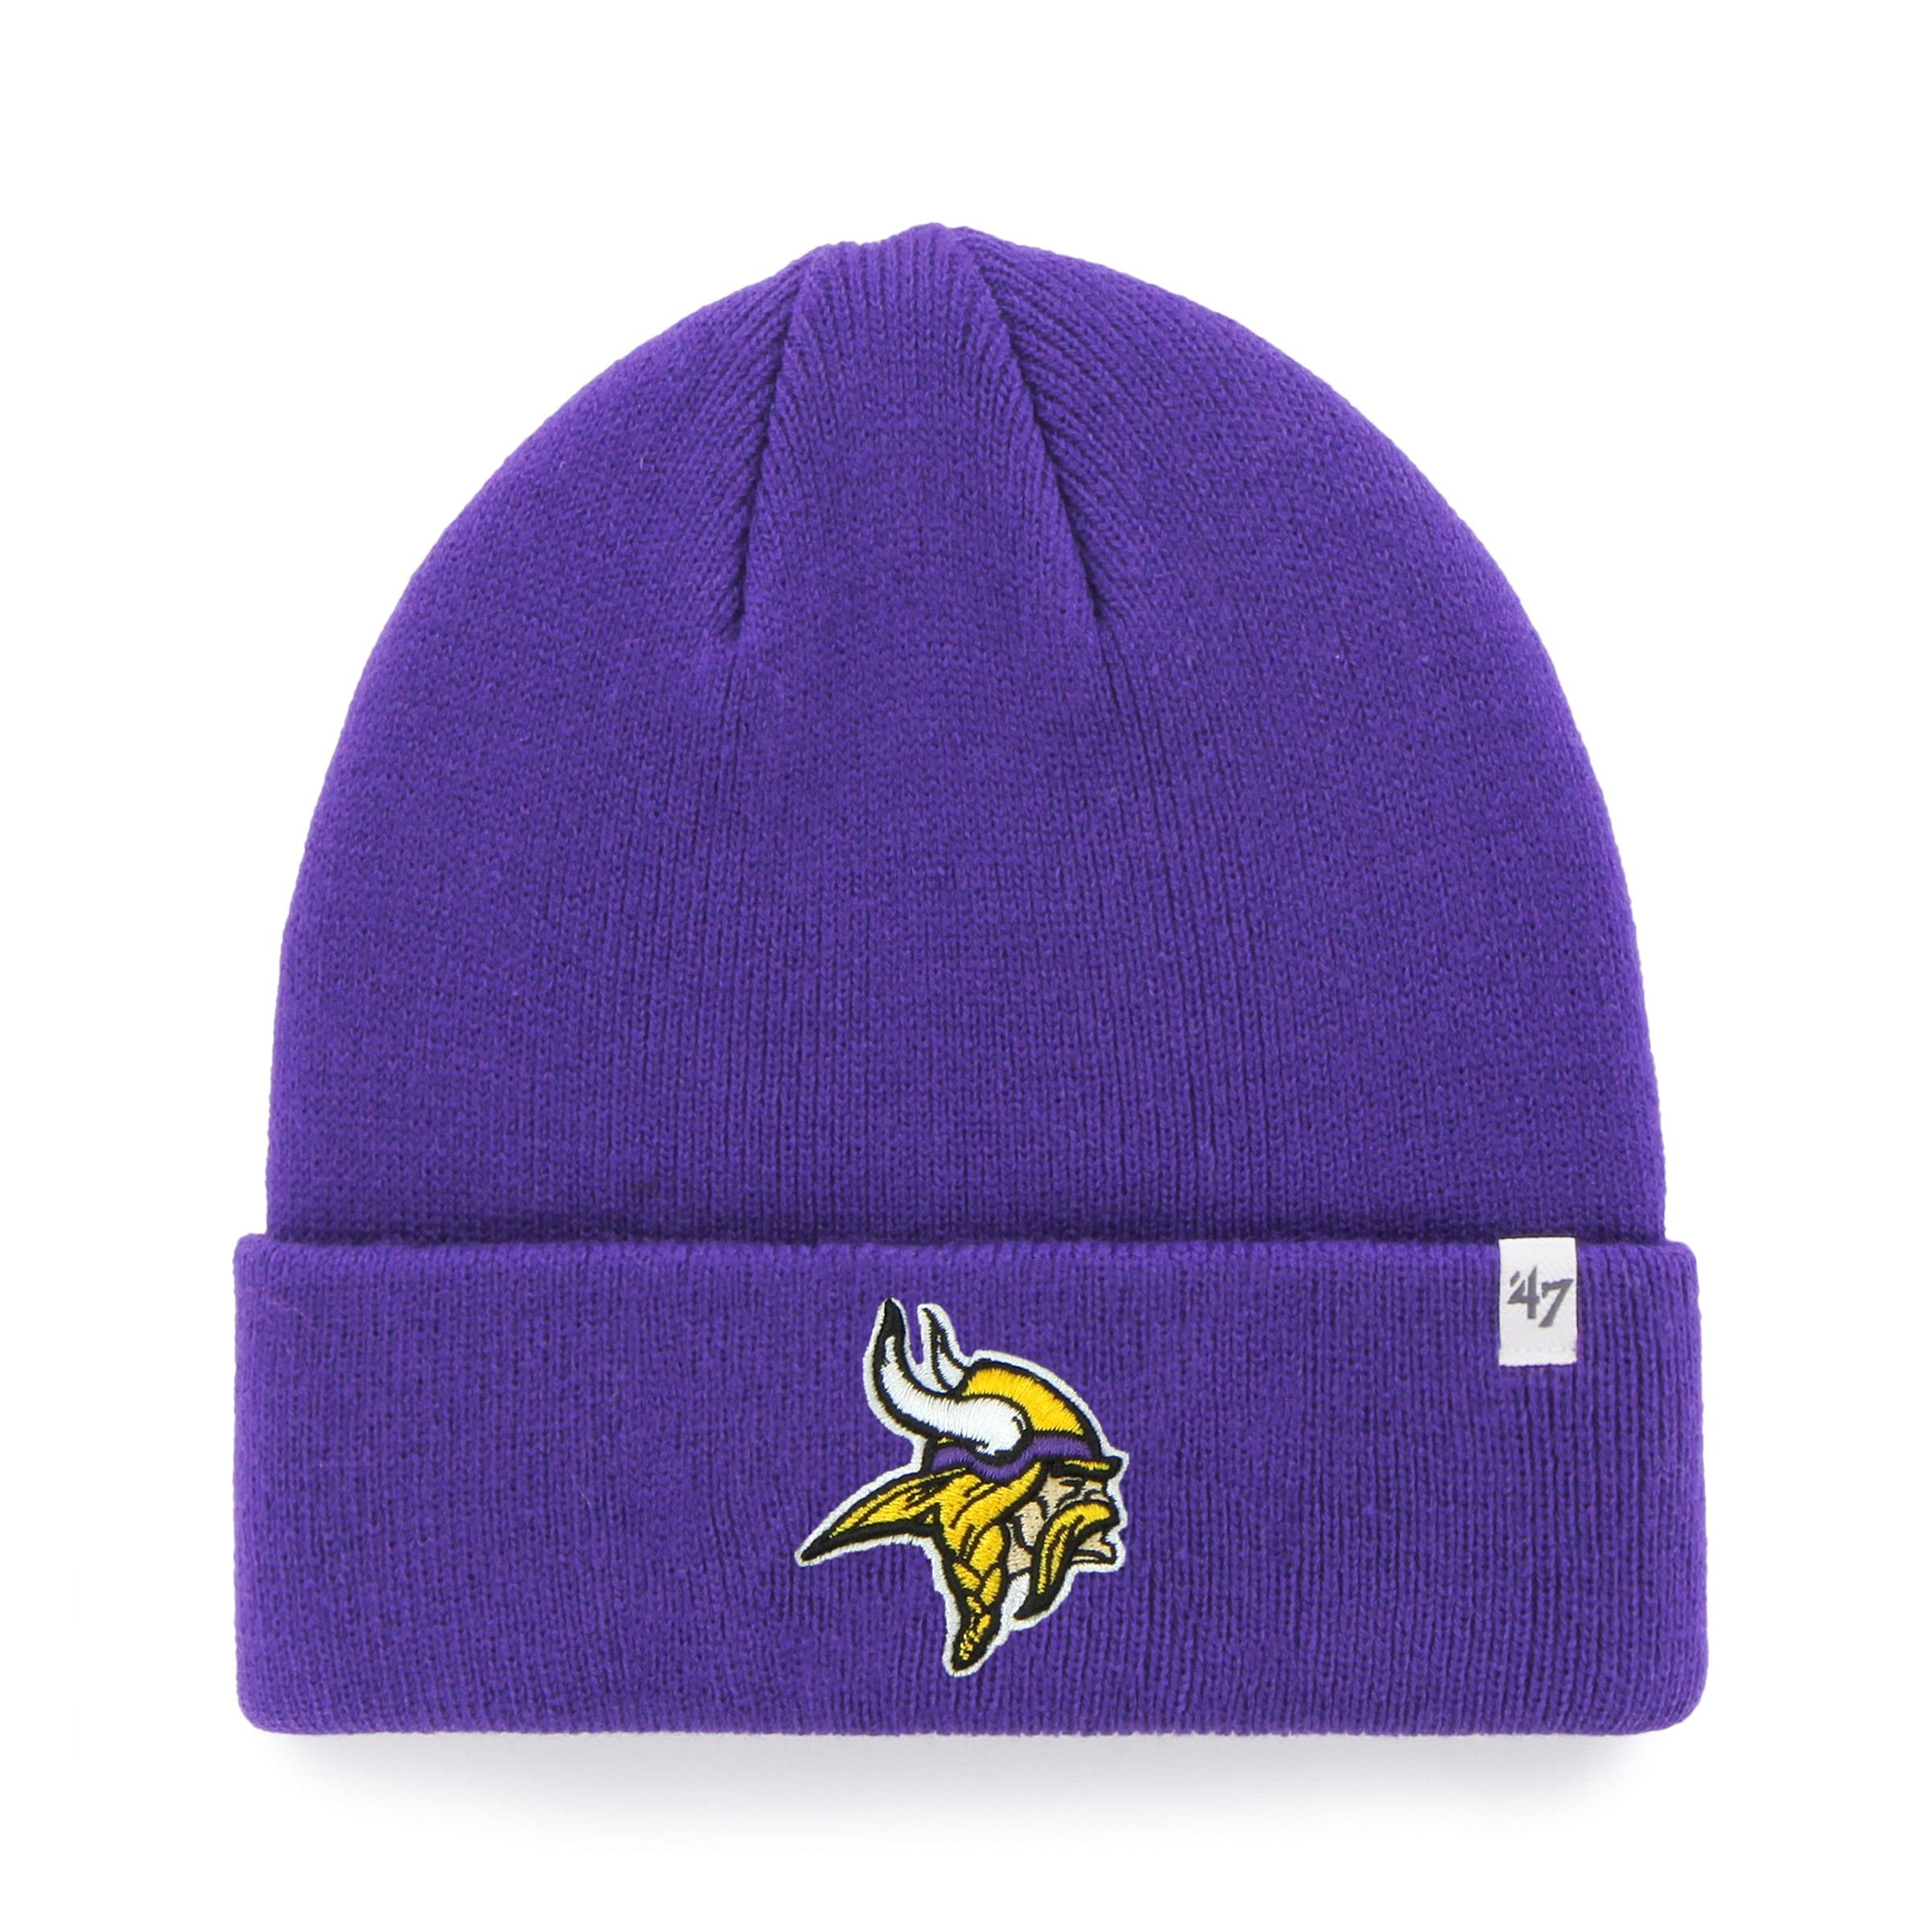 Minnesota Vikings NFL Raised Cuffed Knit Beanie 9e0f5b780